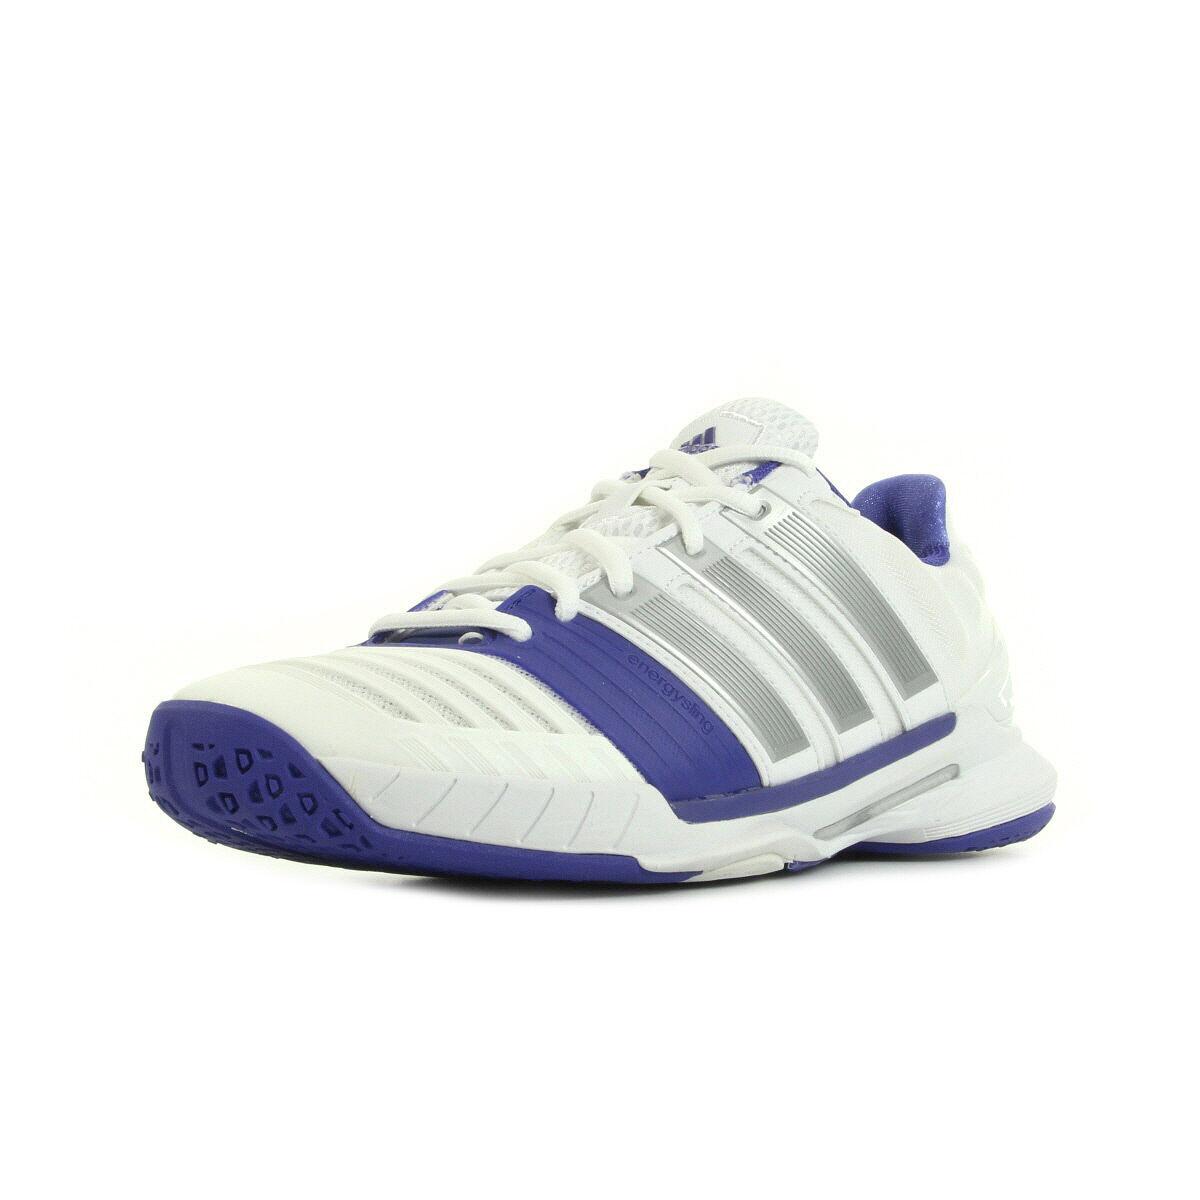 75%] Hallenschuhe Adidas Adipower Stabil 11 (M17488)